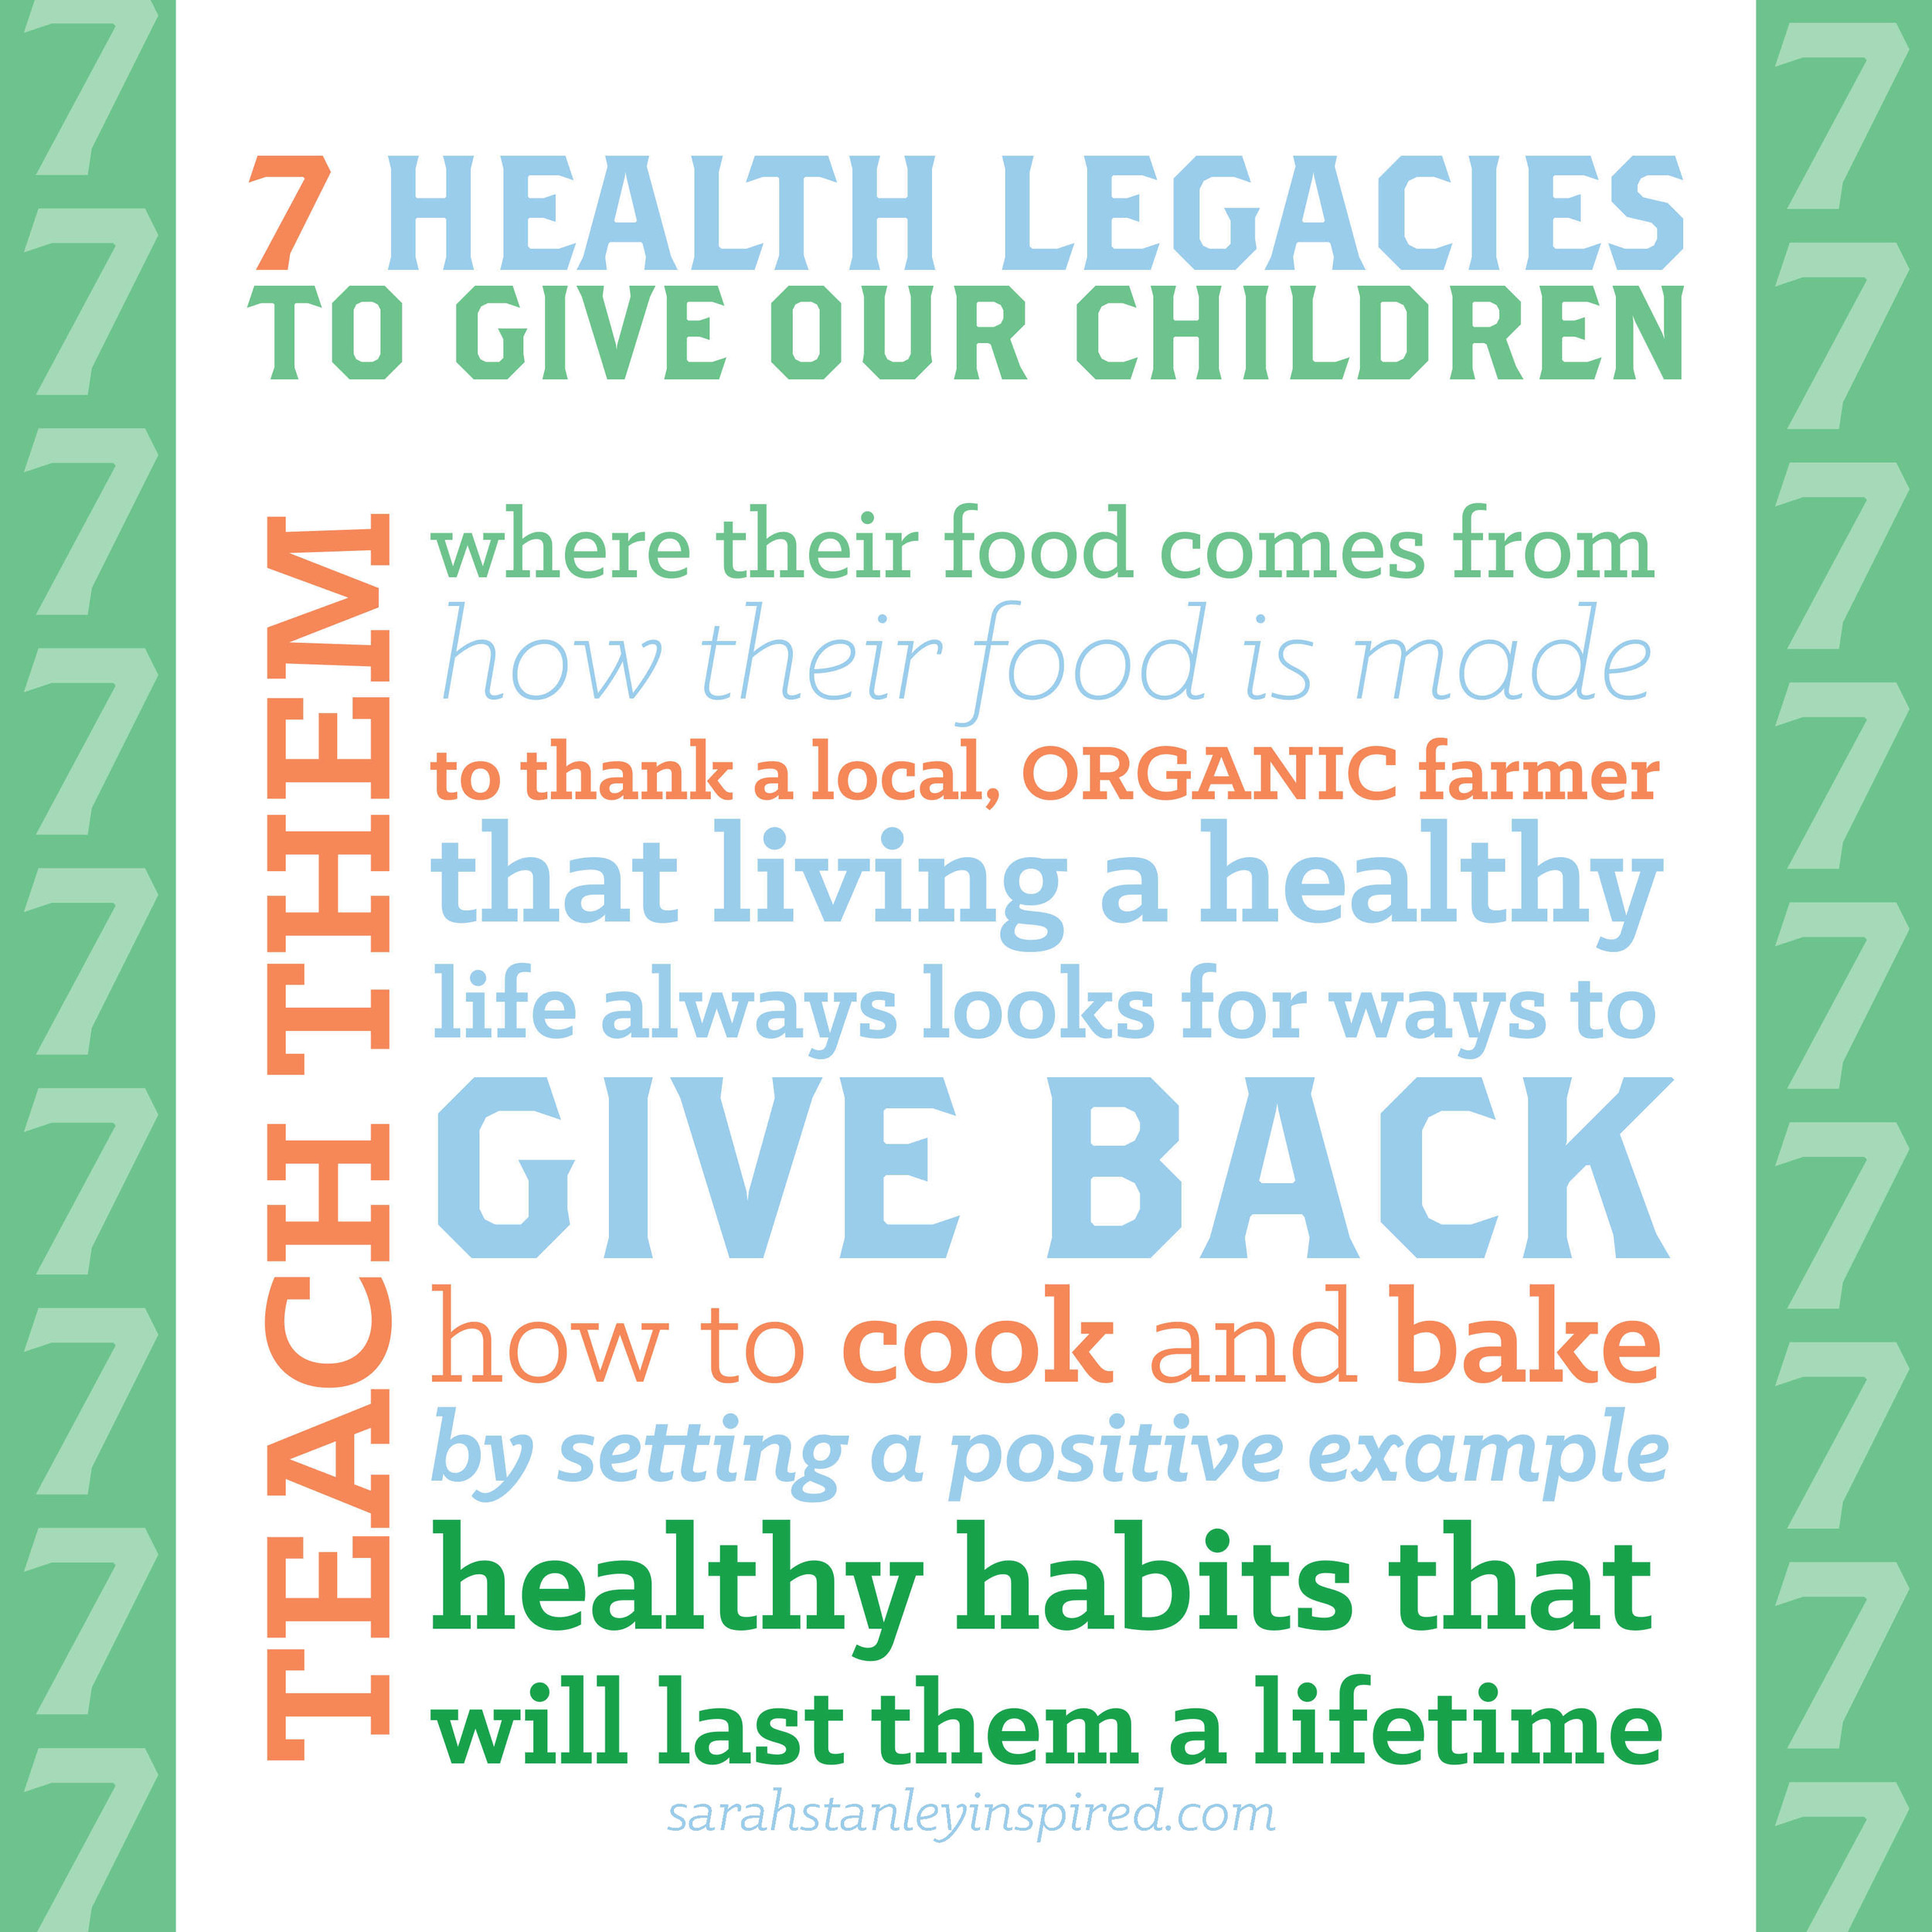 HealthLegacy